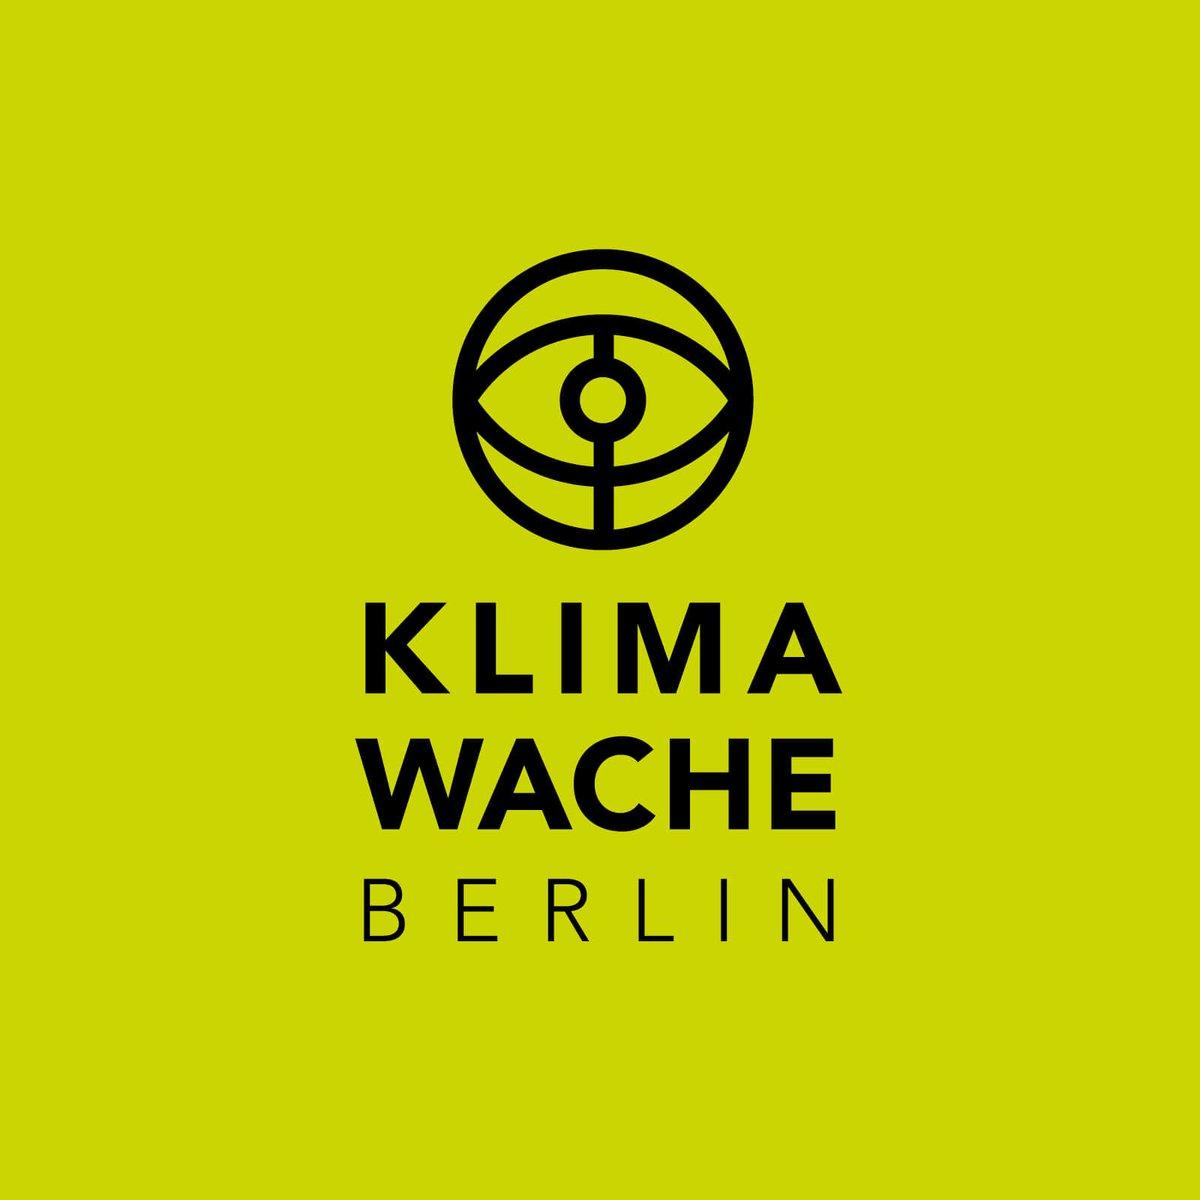 Klimawache Berlin Logoentwicklung. #BlhHamburg #KlimawacheBerlin #Climate #Logo #Logoentwicklung #Logodesign #Grafikdesign #CorporateDesign #Markenbildung #Marke #Marketing #Branding